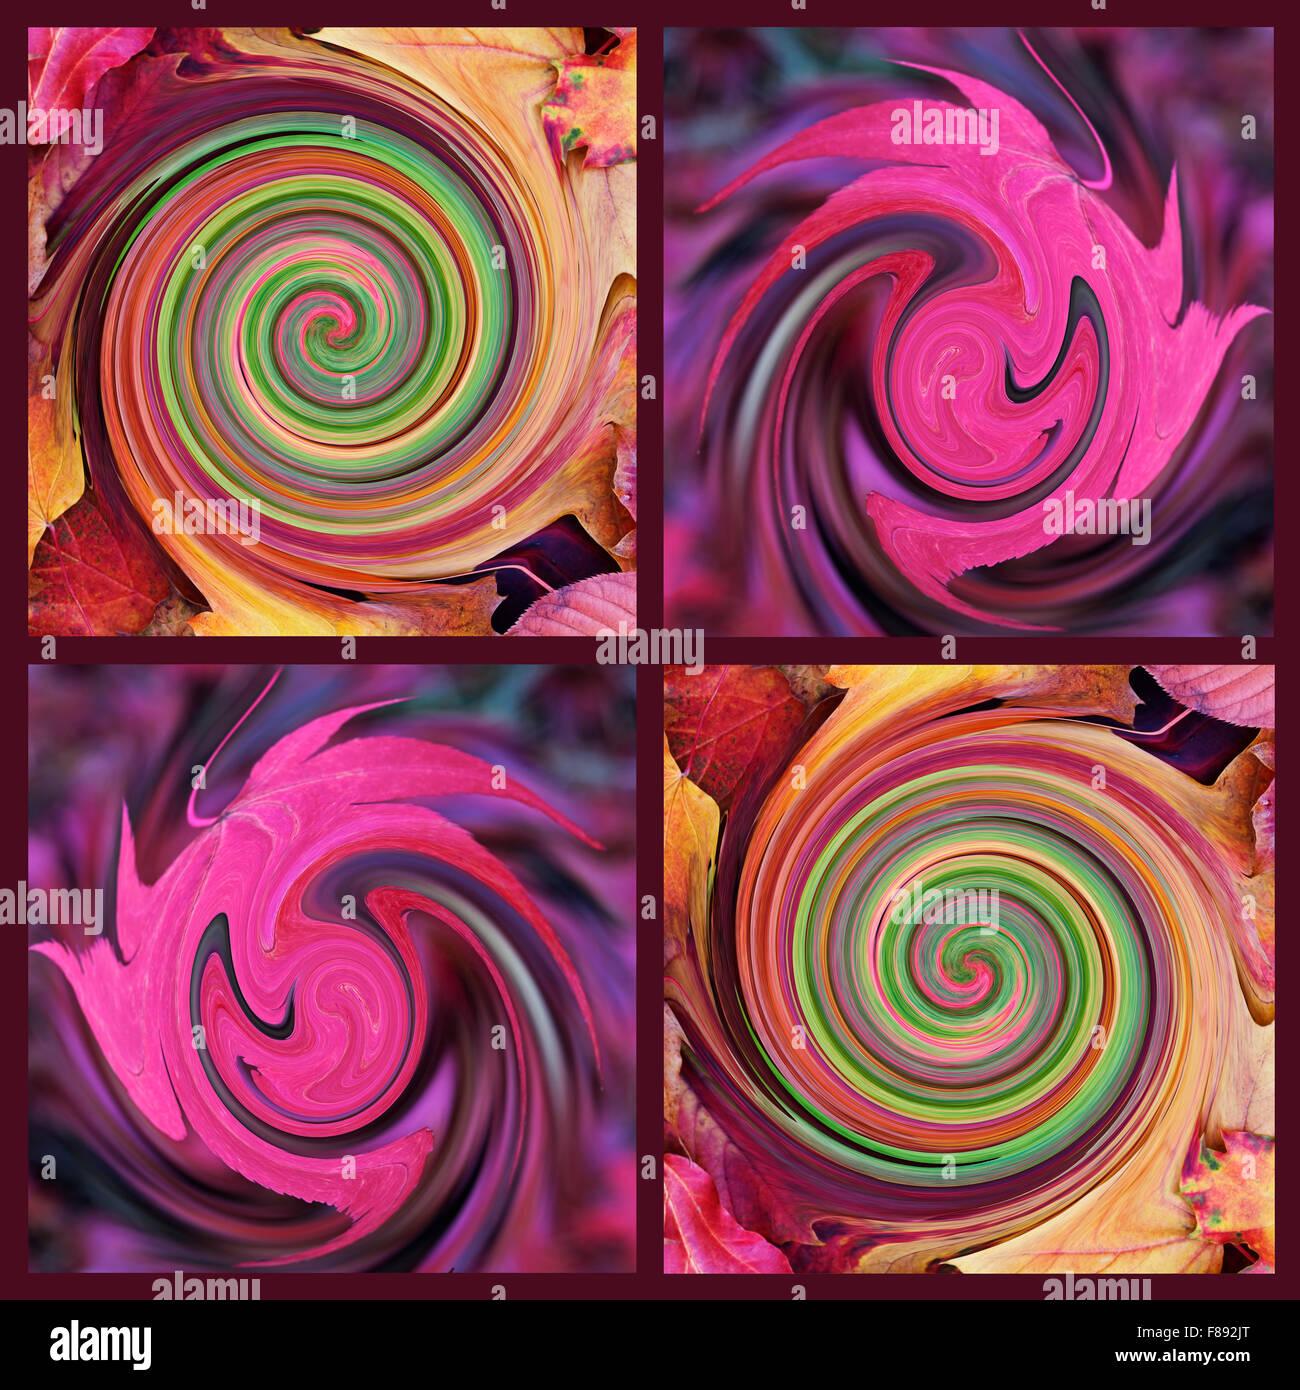 Abstract swirls - Stock Image